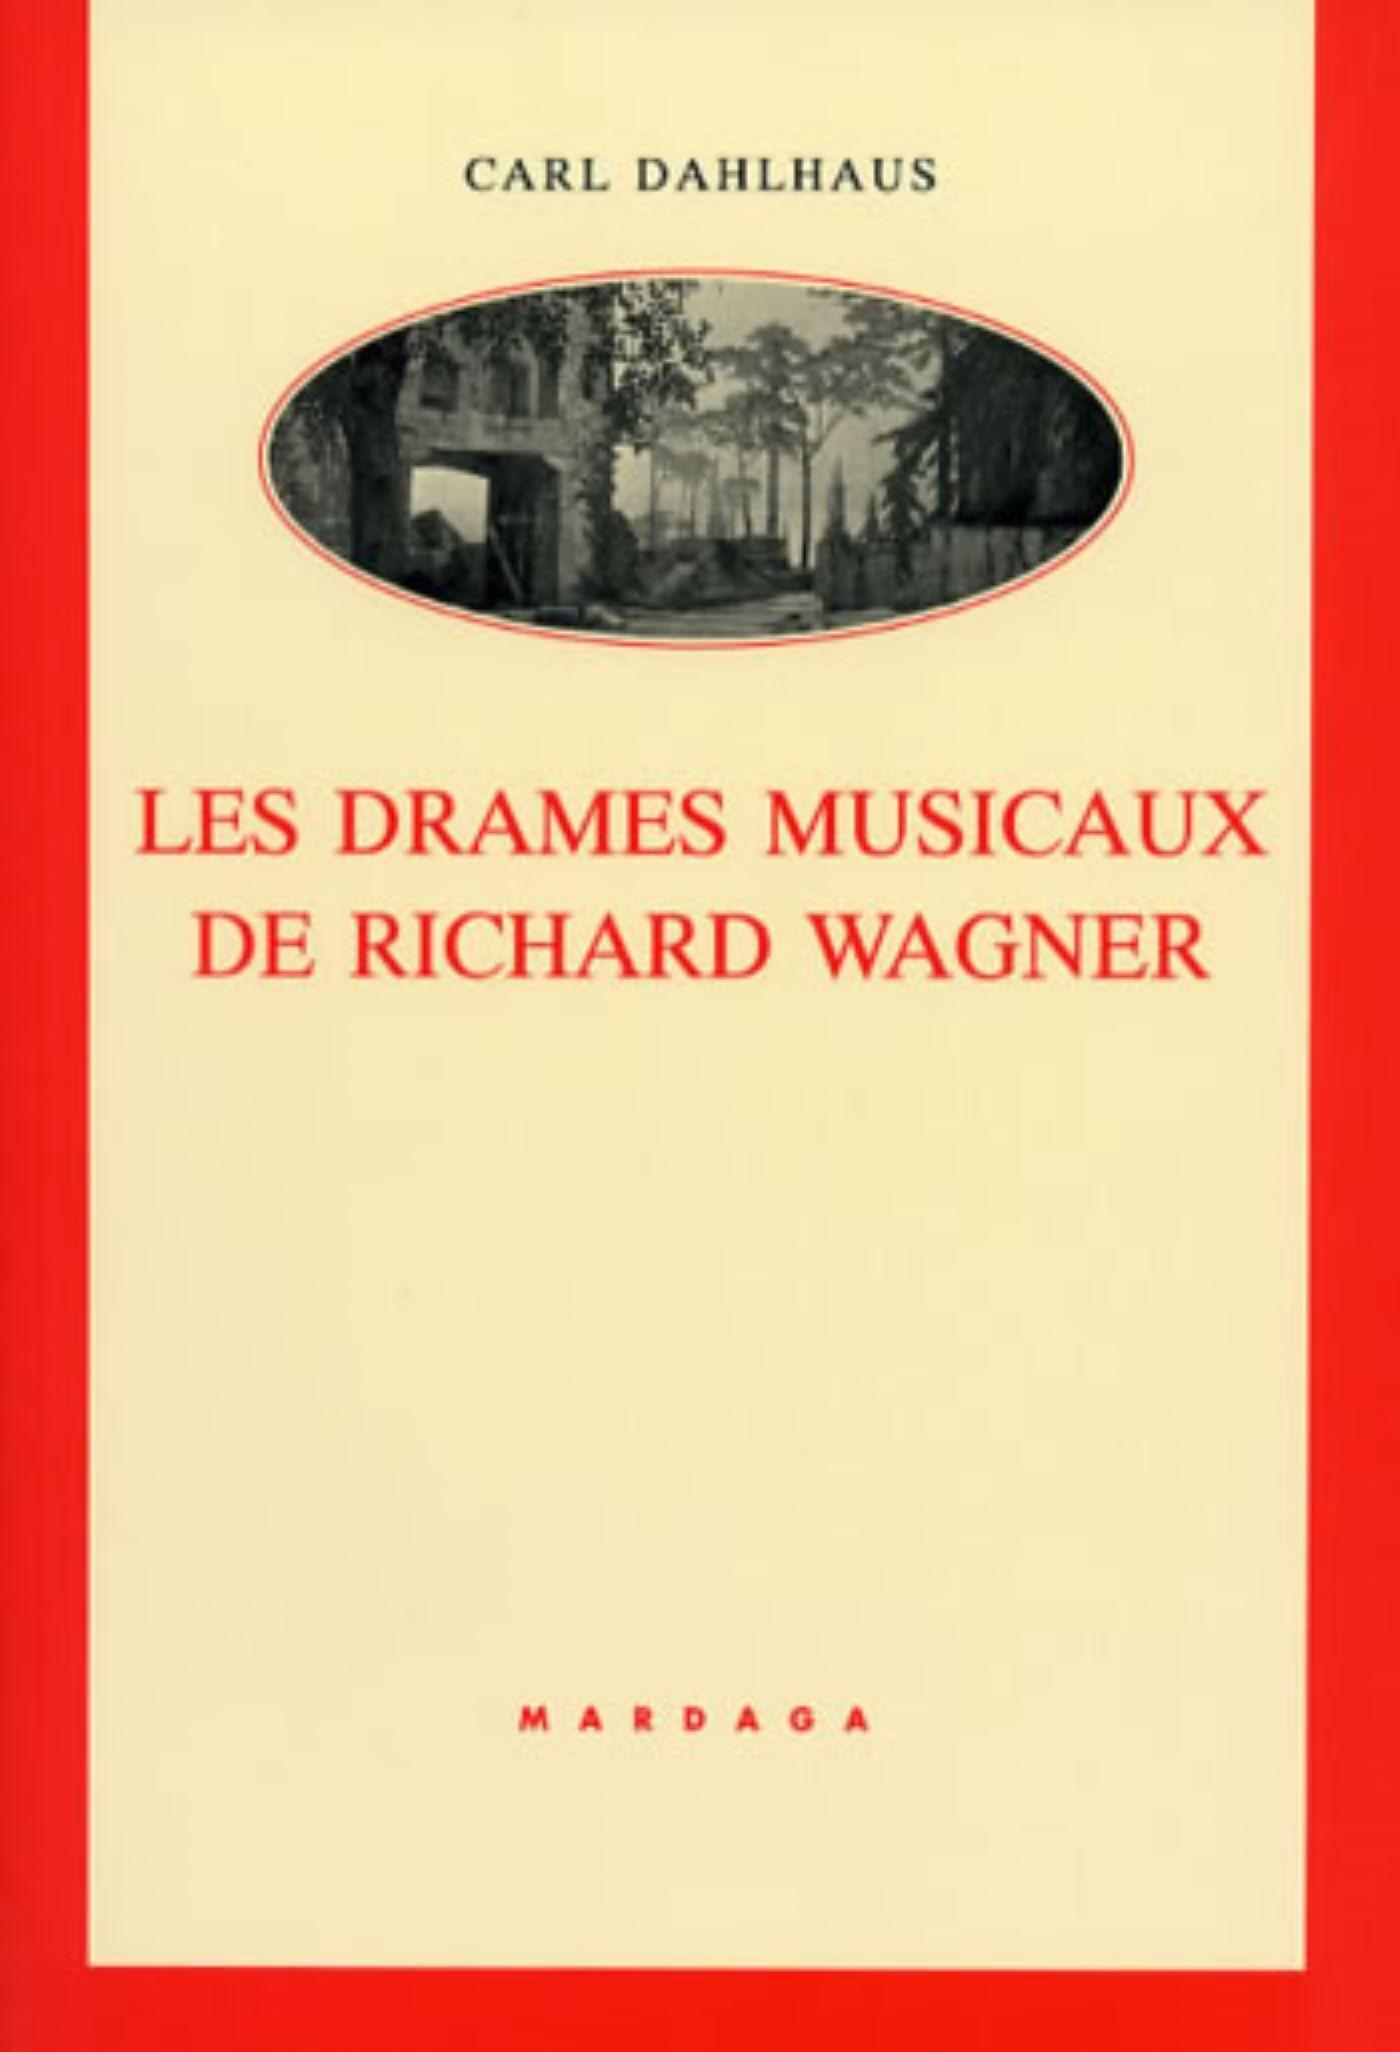 DRAMES MUSICAUX DE RICHARD WAGNER